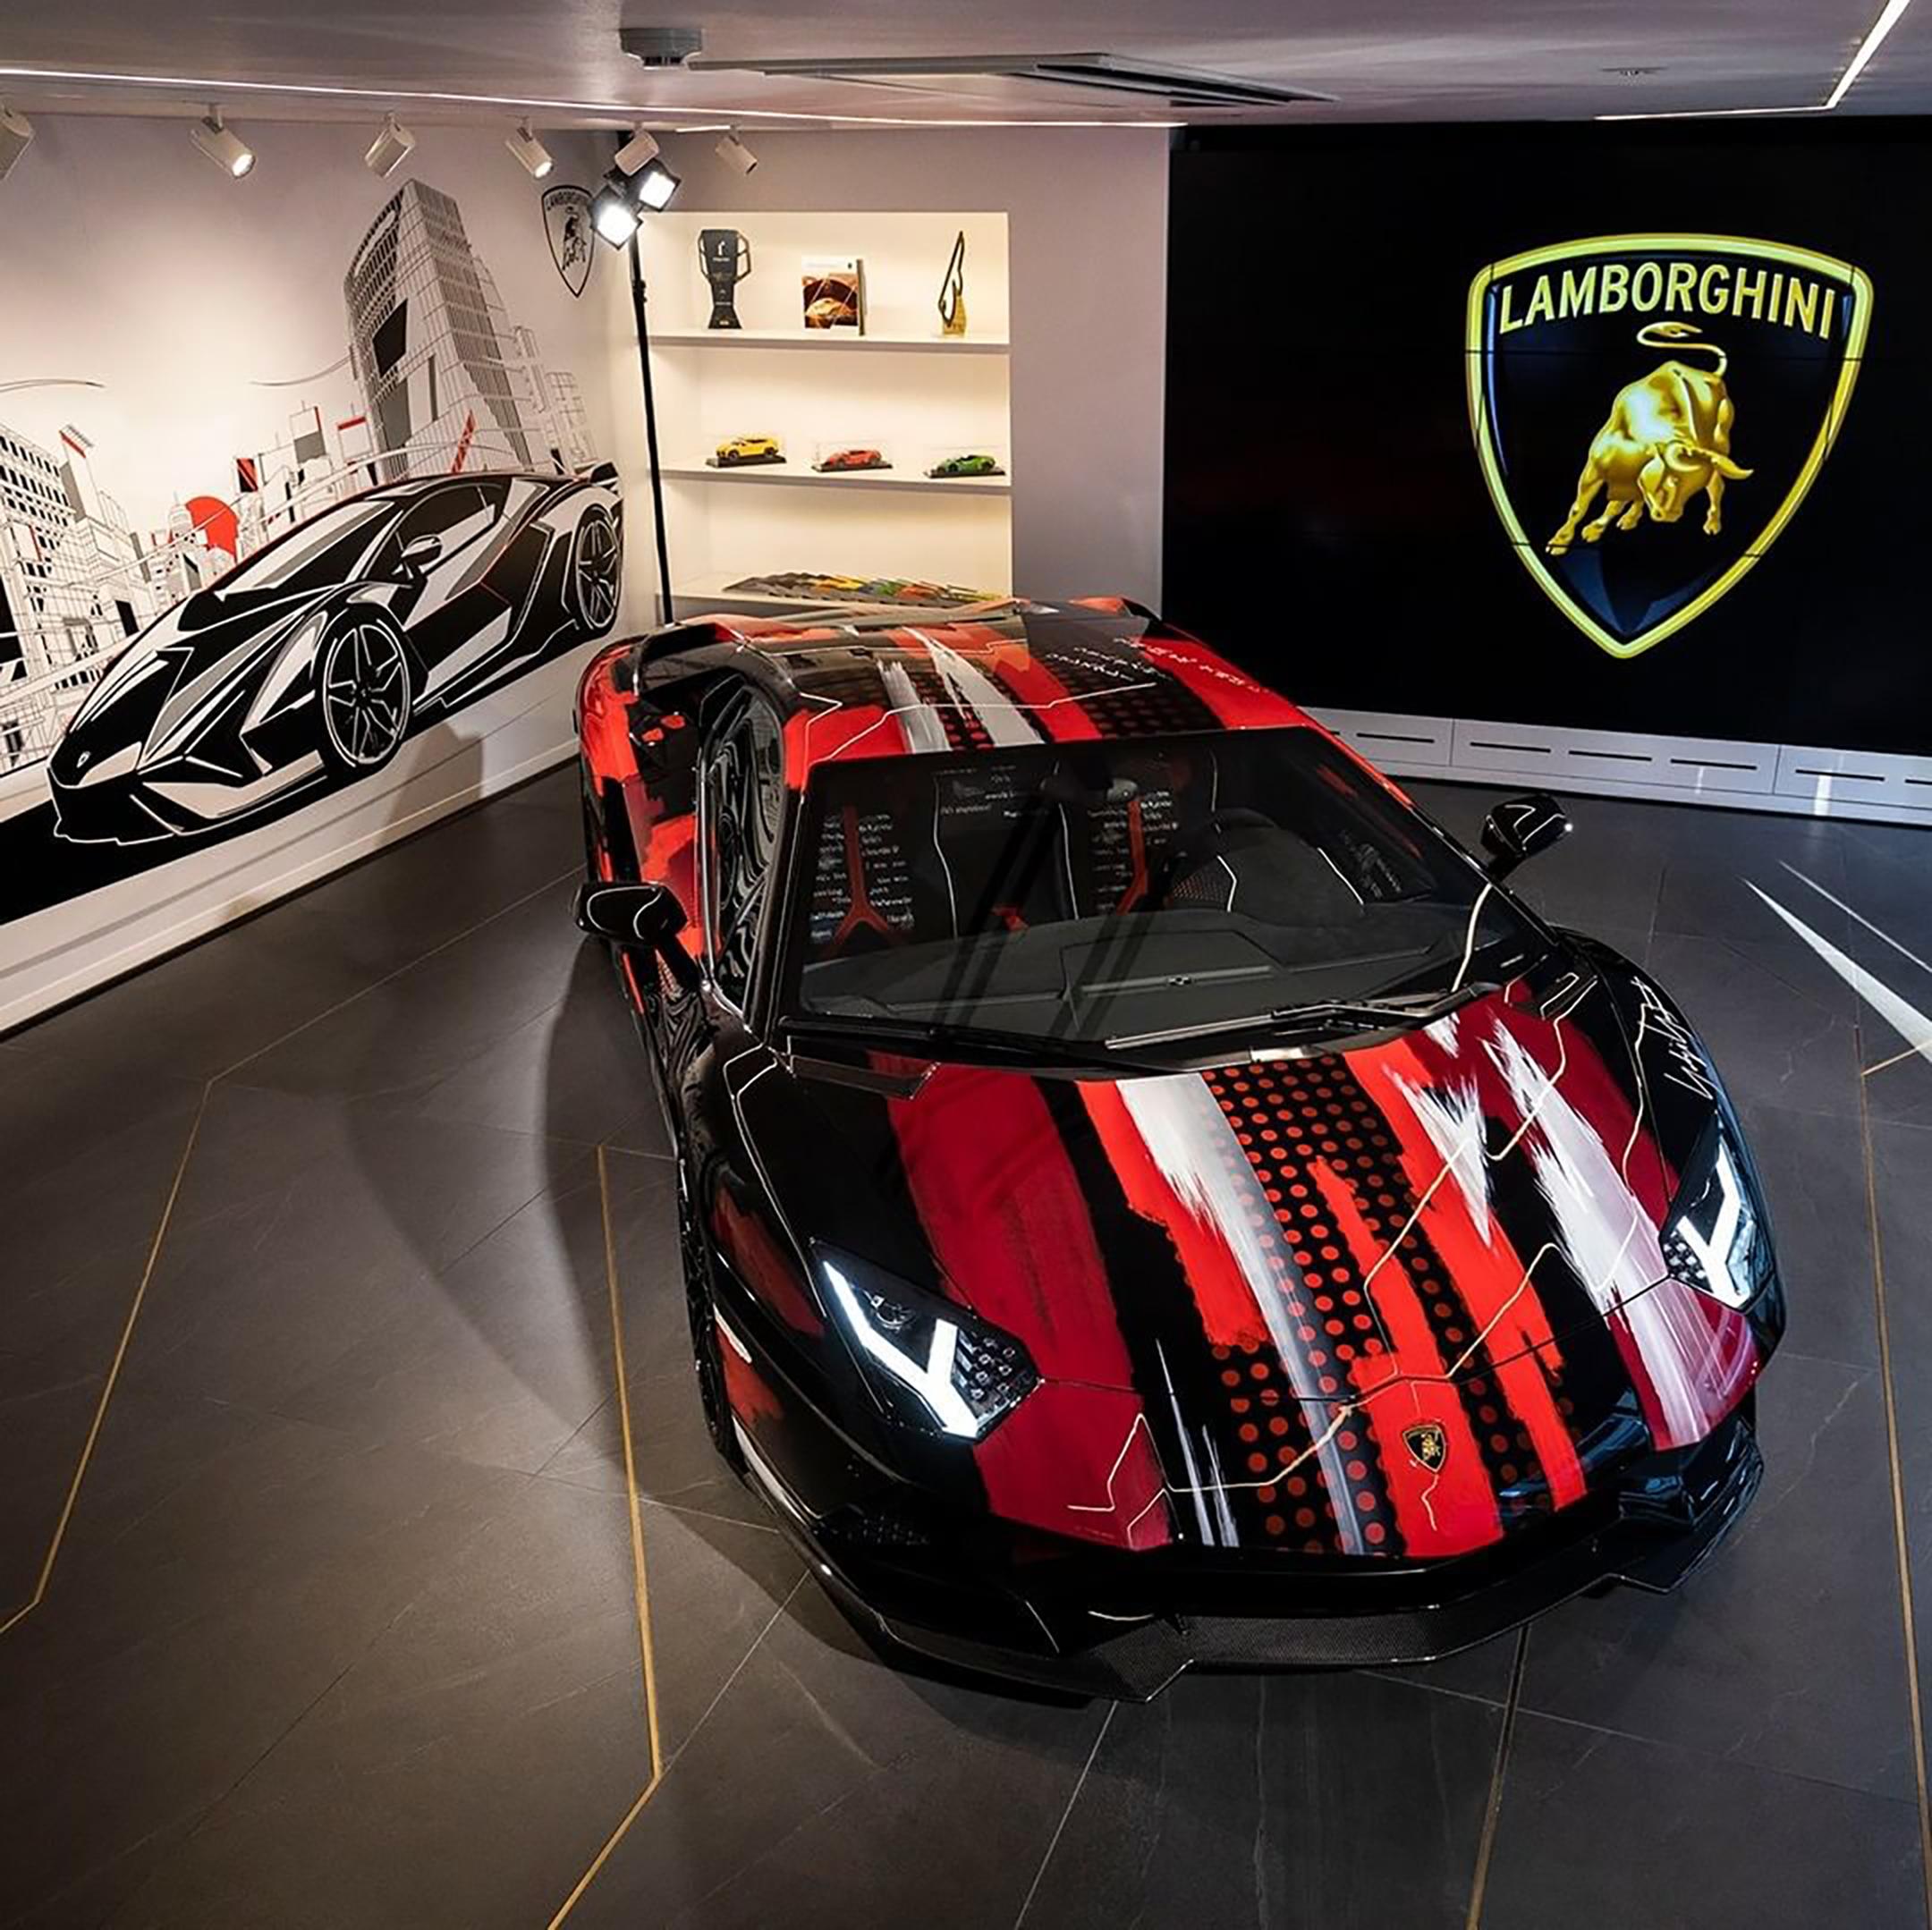 Lamborghini Aventador S x Yohji Yamamoto fashion designer - 2020 - THE LOUNGE TOKYO - preview